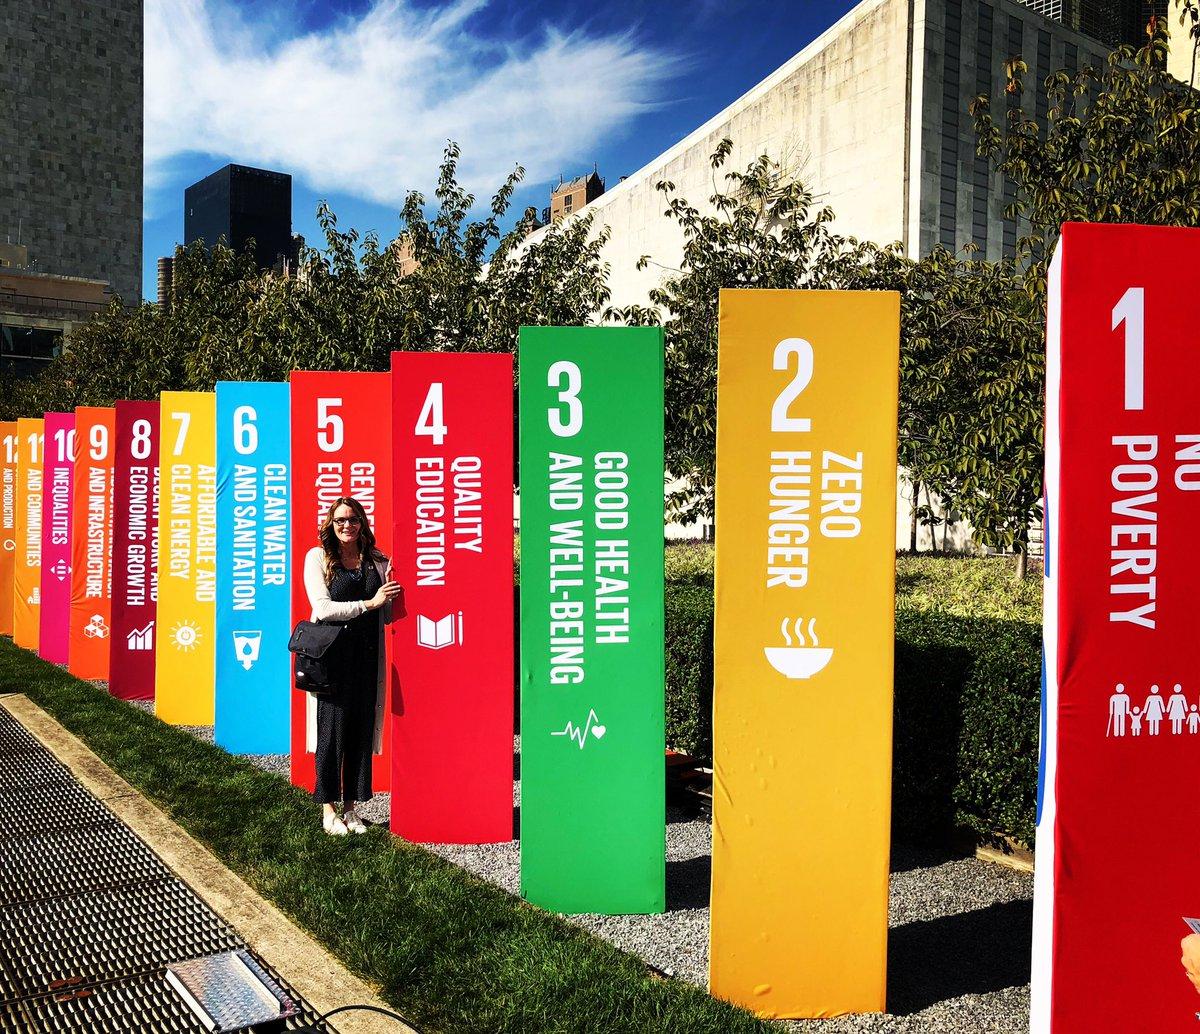 SDG Action Zone! #2030now #Agenda2030 #TeachSDGs #GoalsProject #ClimateActionP